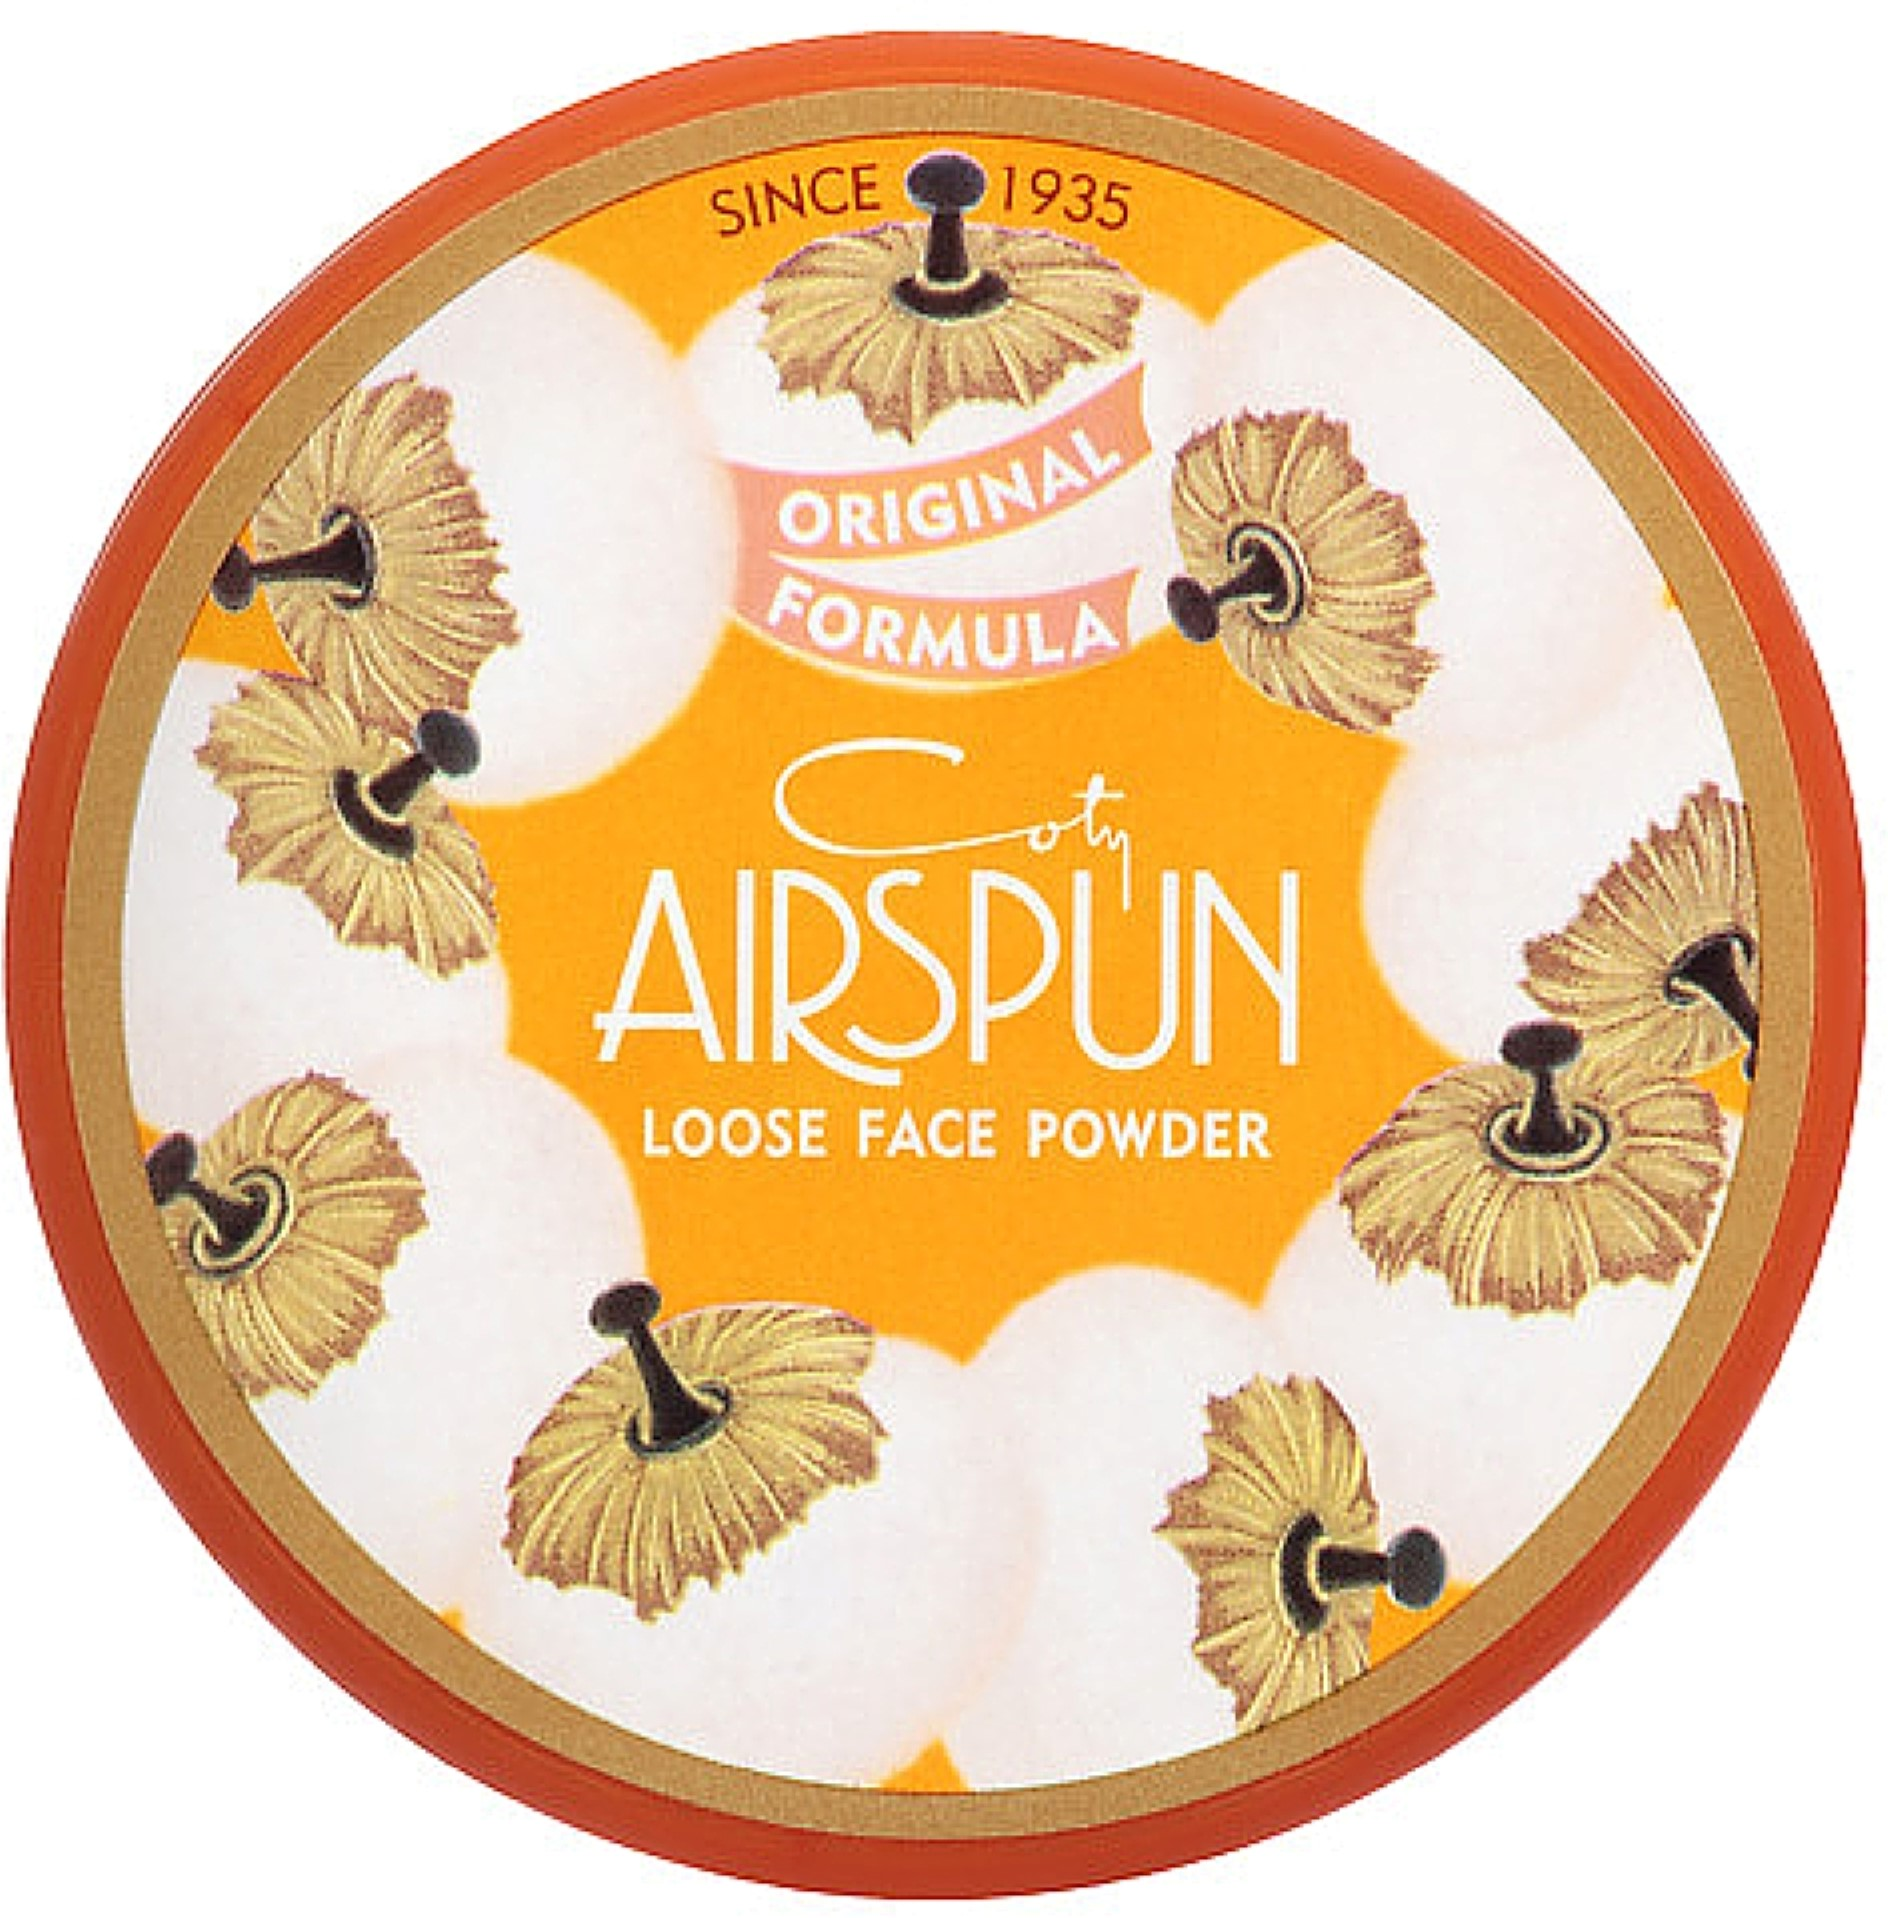 Coty Airspun Loose Face Powder, Honey Beige 2.30 oz (Pack...